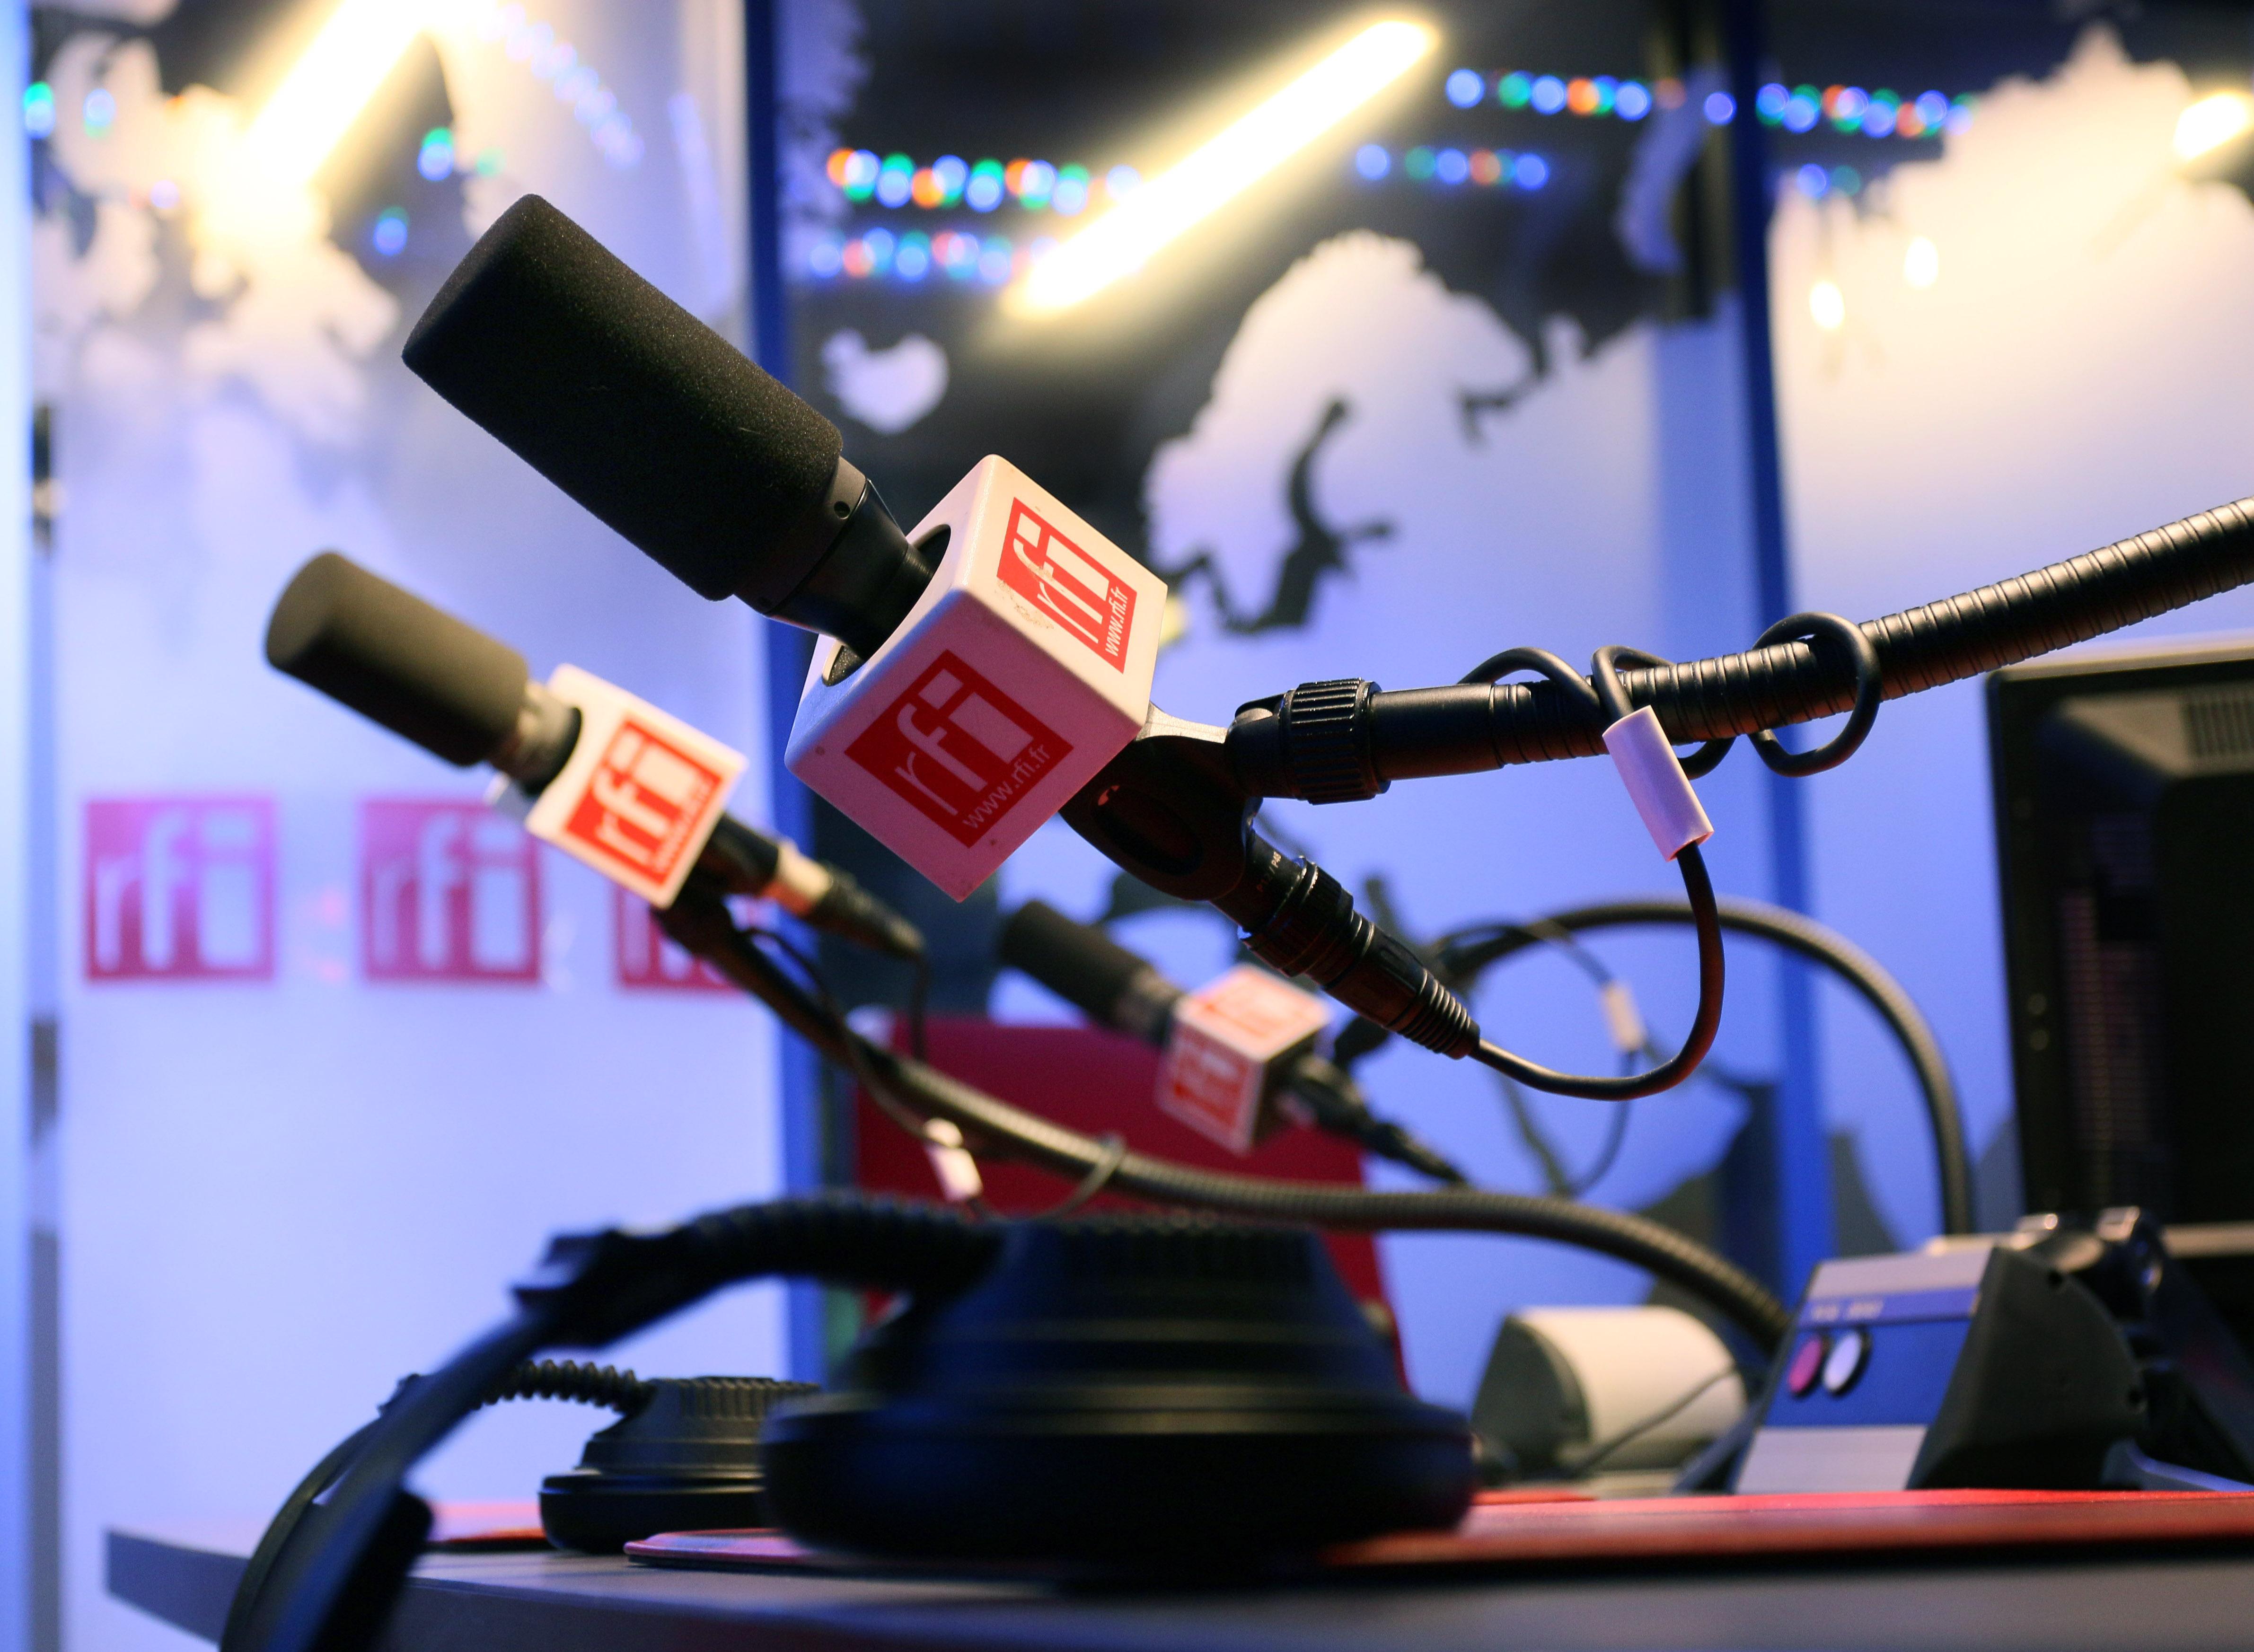 RFI diffusée en direct à Addis Abeba